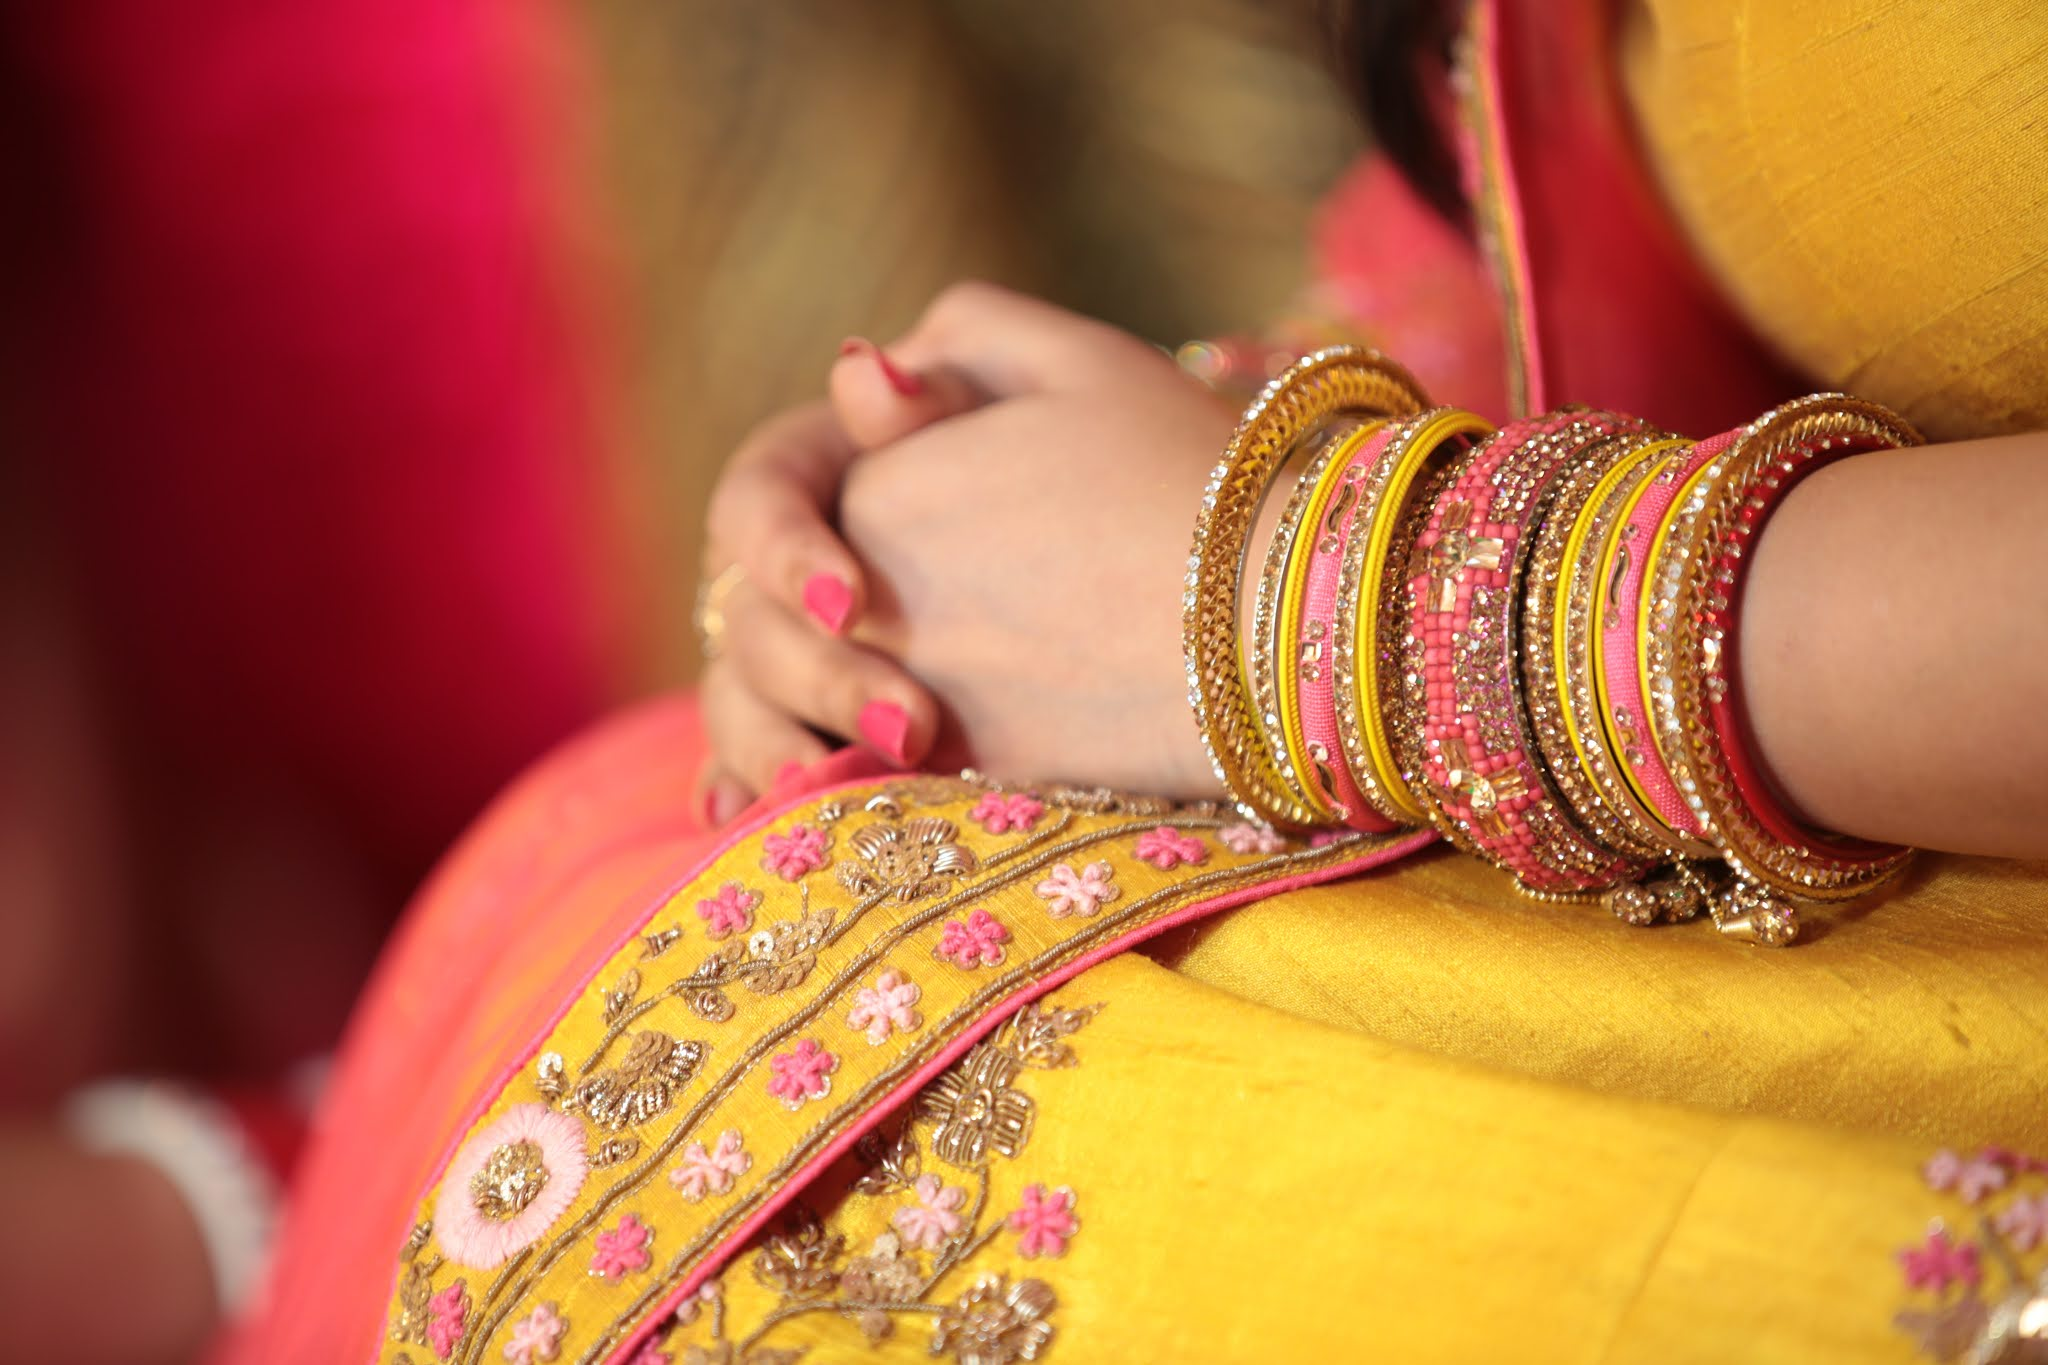 Why do Indian women wear bangles?